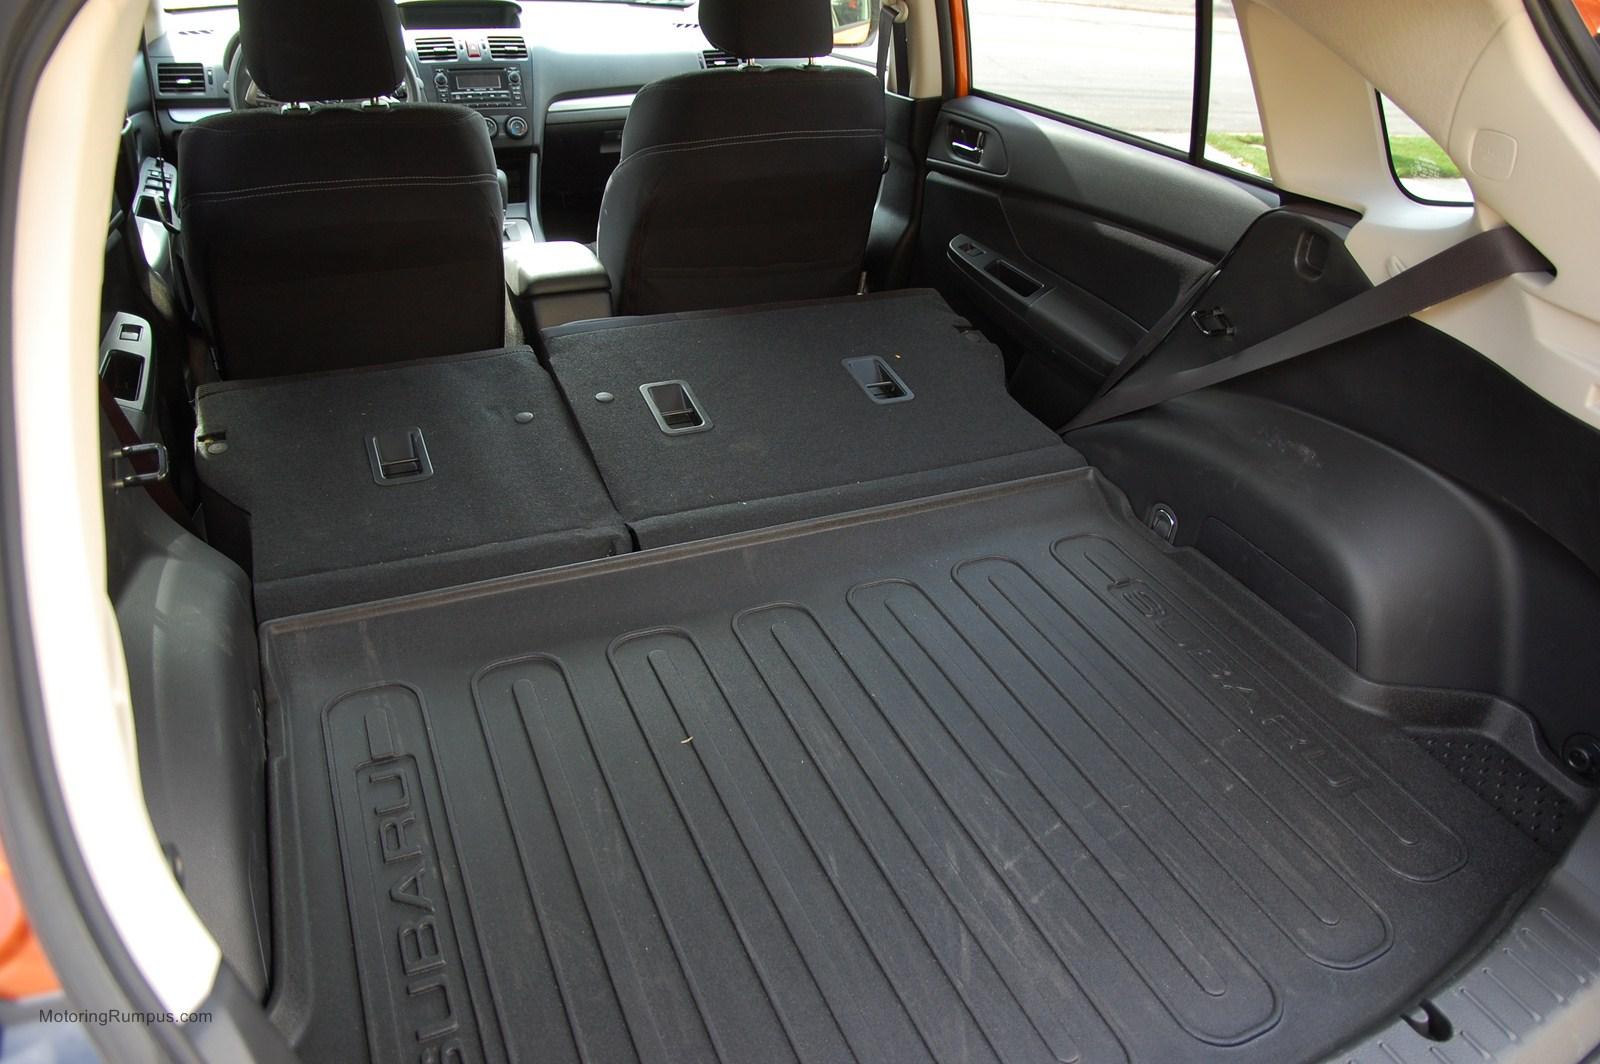 2014 Subaru XV Crosstrek Review - Motoring Rumpus